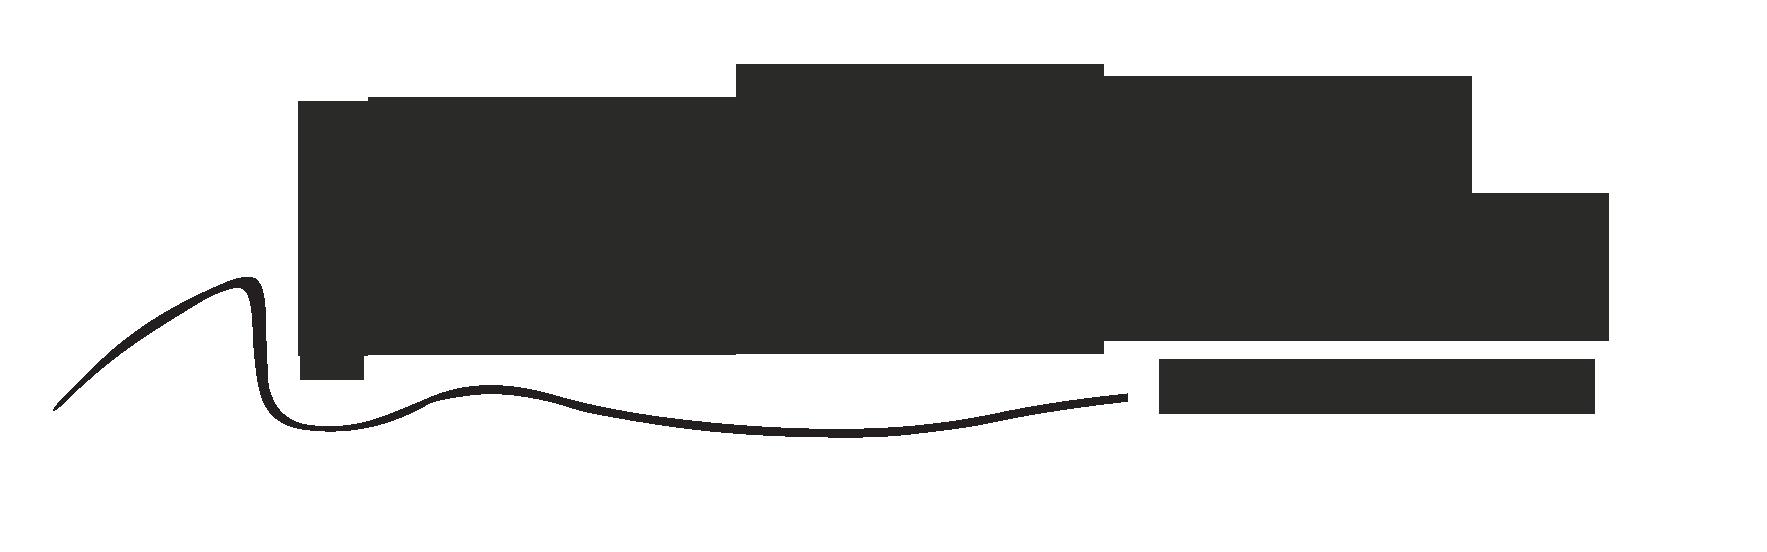 jamie-roman-design